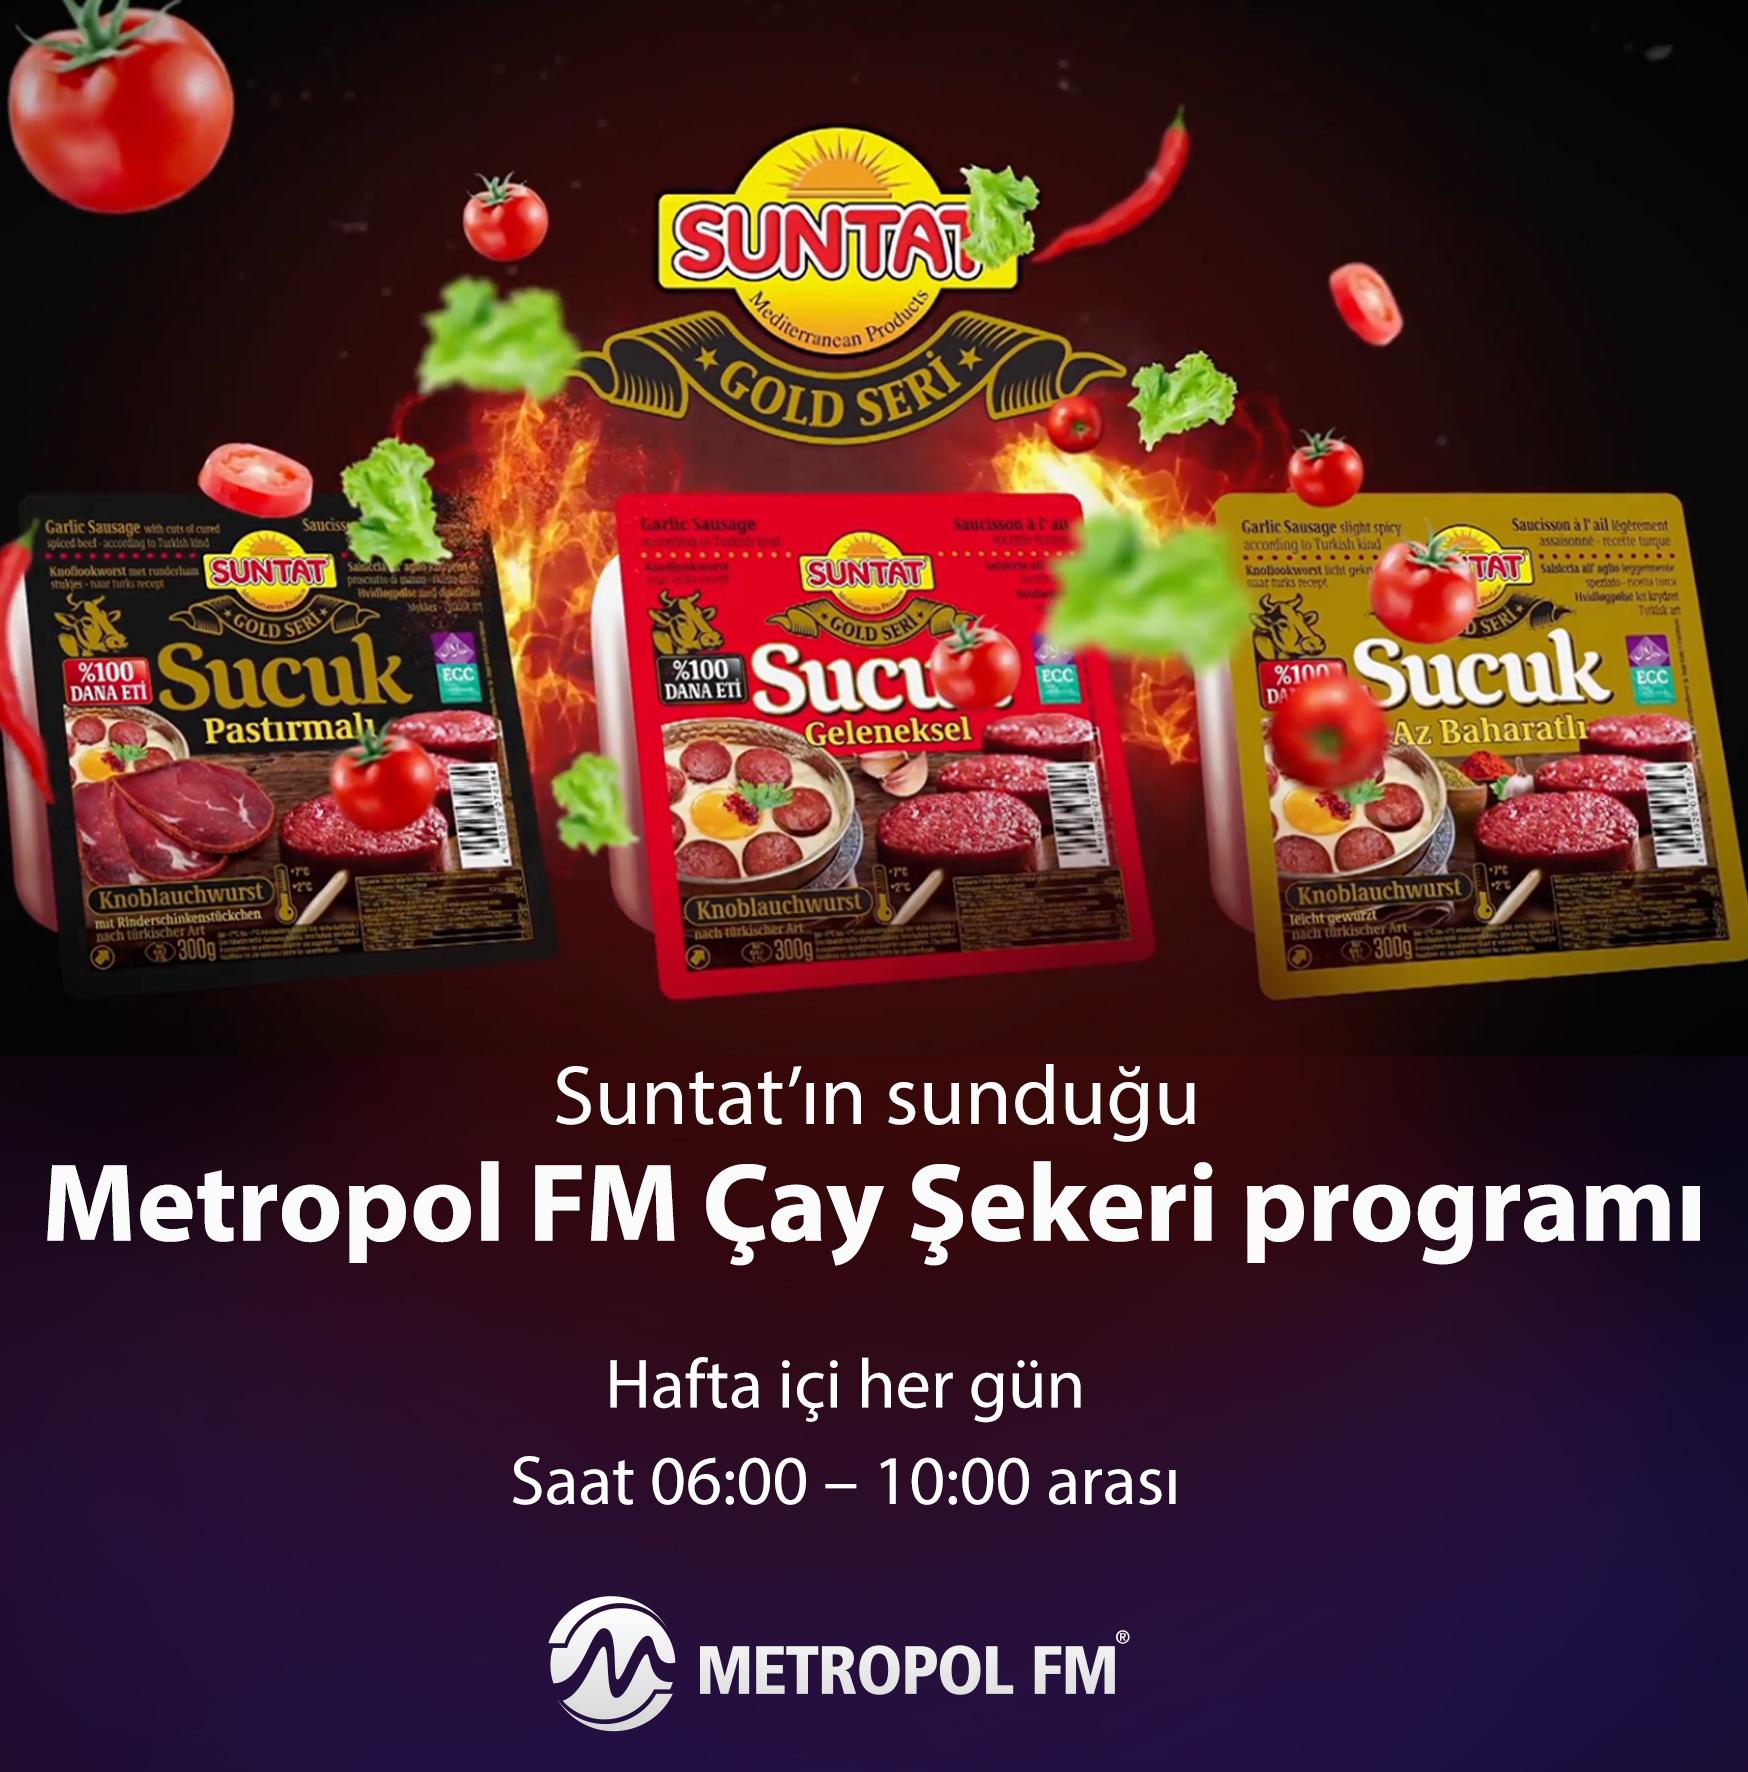 METROPOL FM ÇAY ŞEKERİ